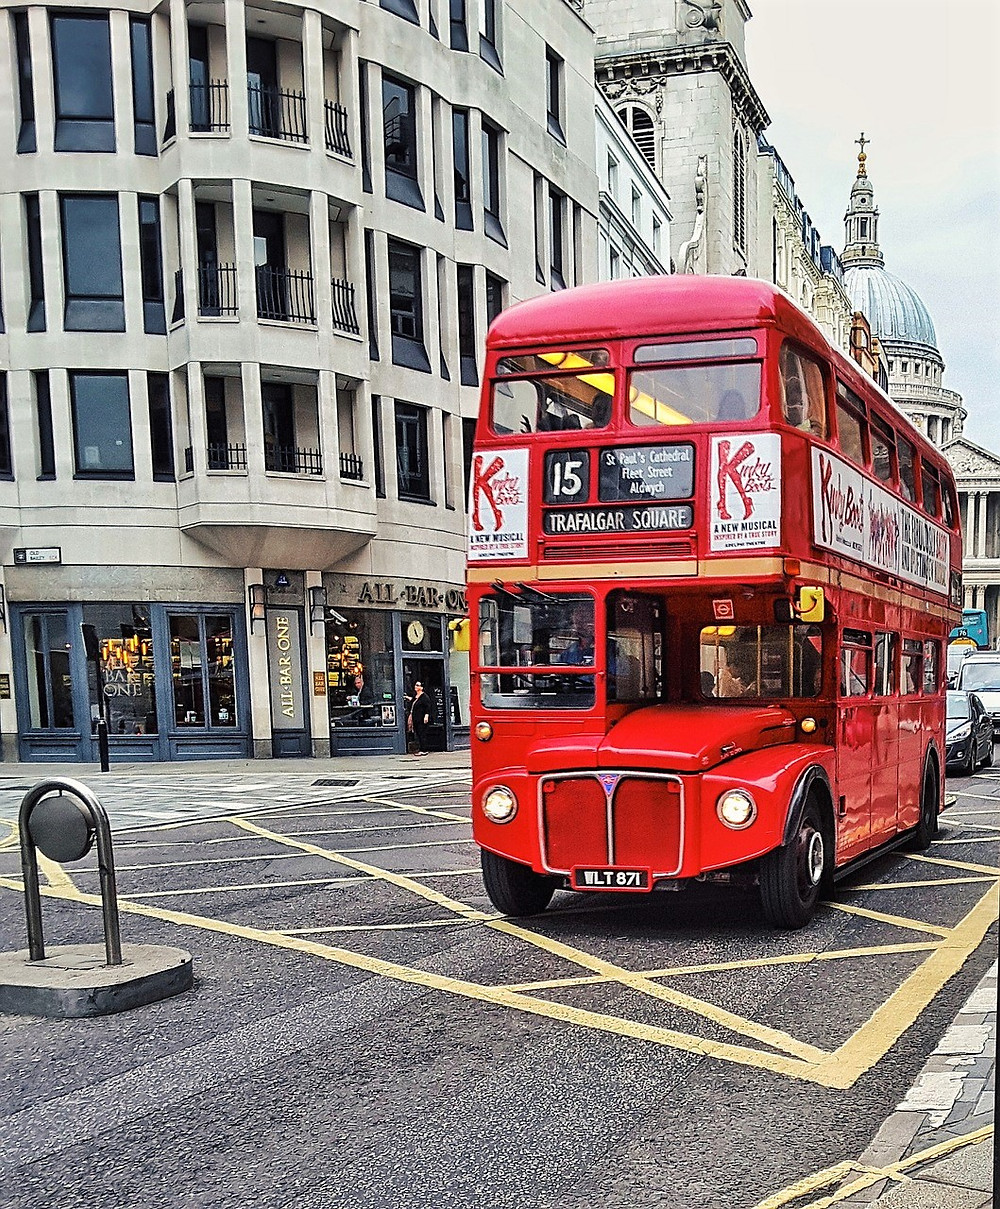 DOUBLE DECKER BUS DOWNTOWN LONDON